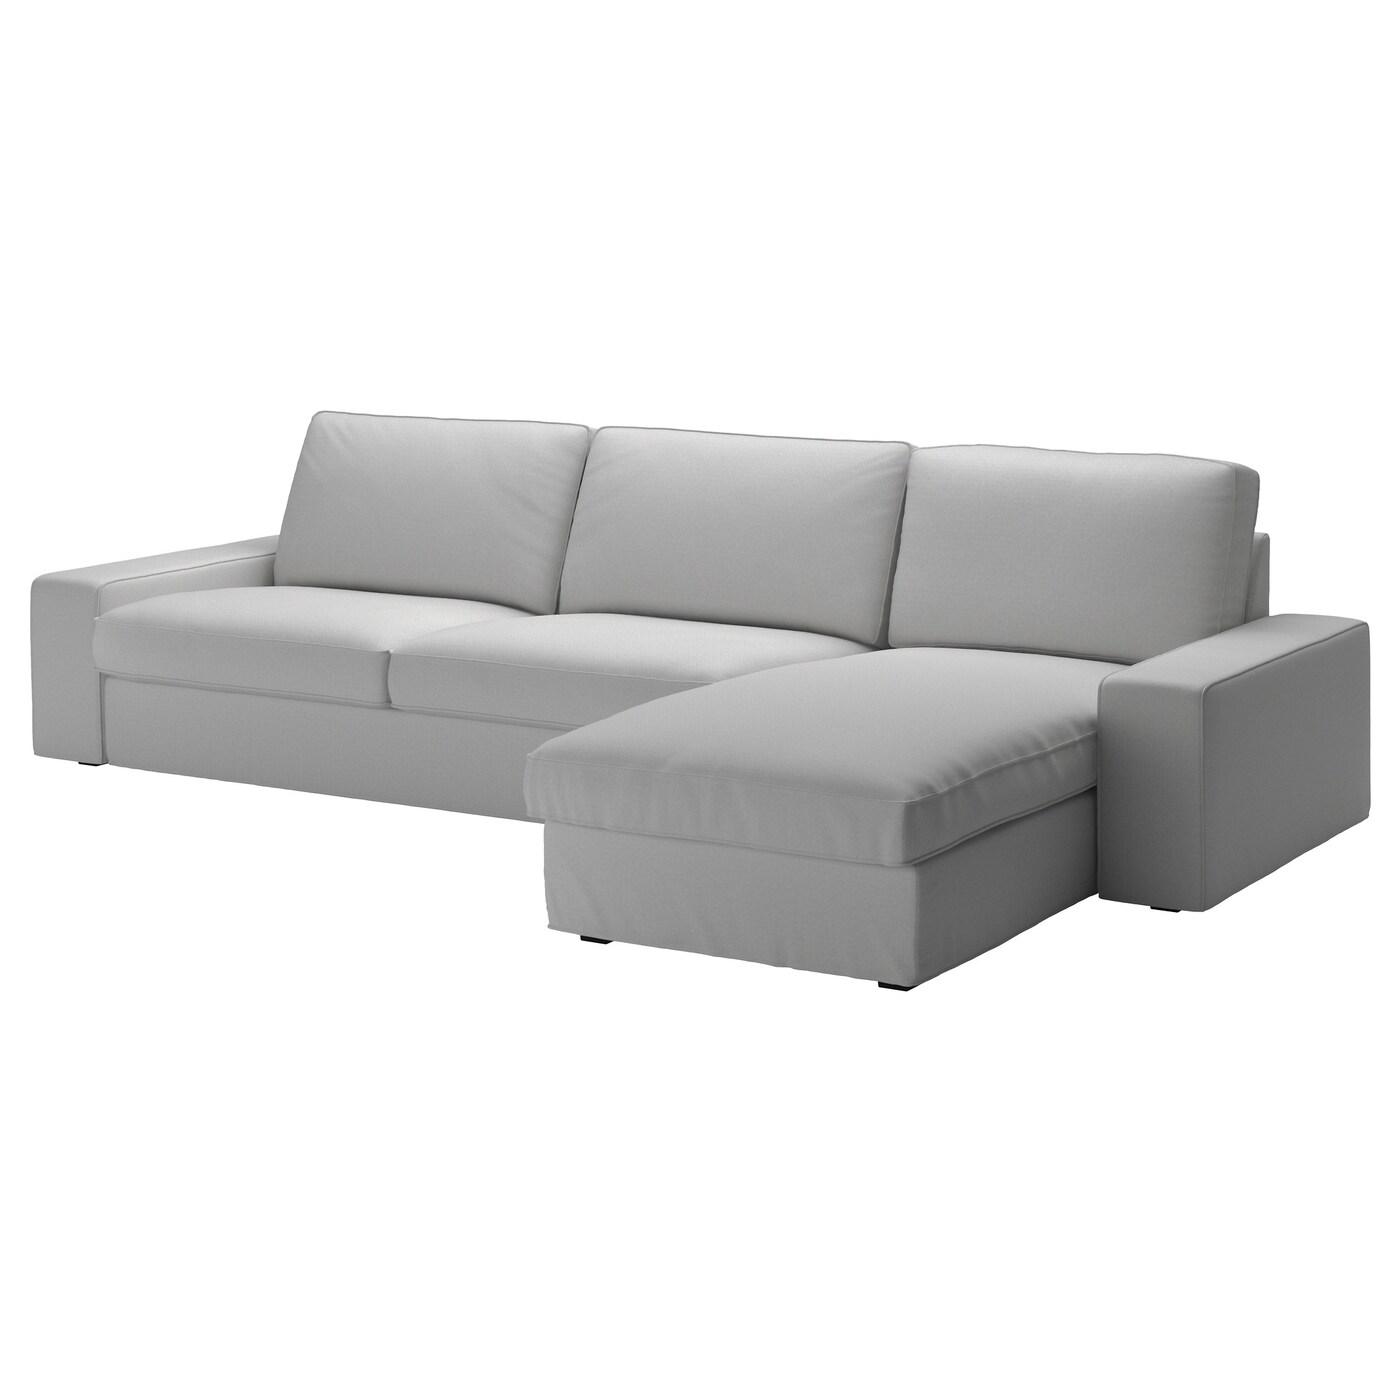 IKEA KIVIK jasnoszara sofa czteroosobowa z szezlongiem